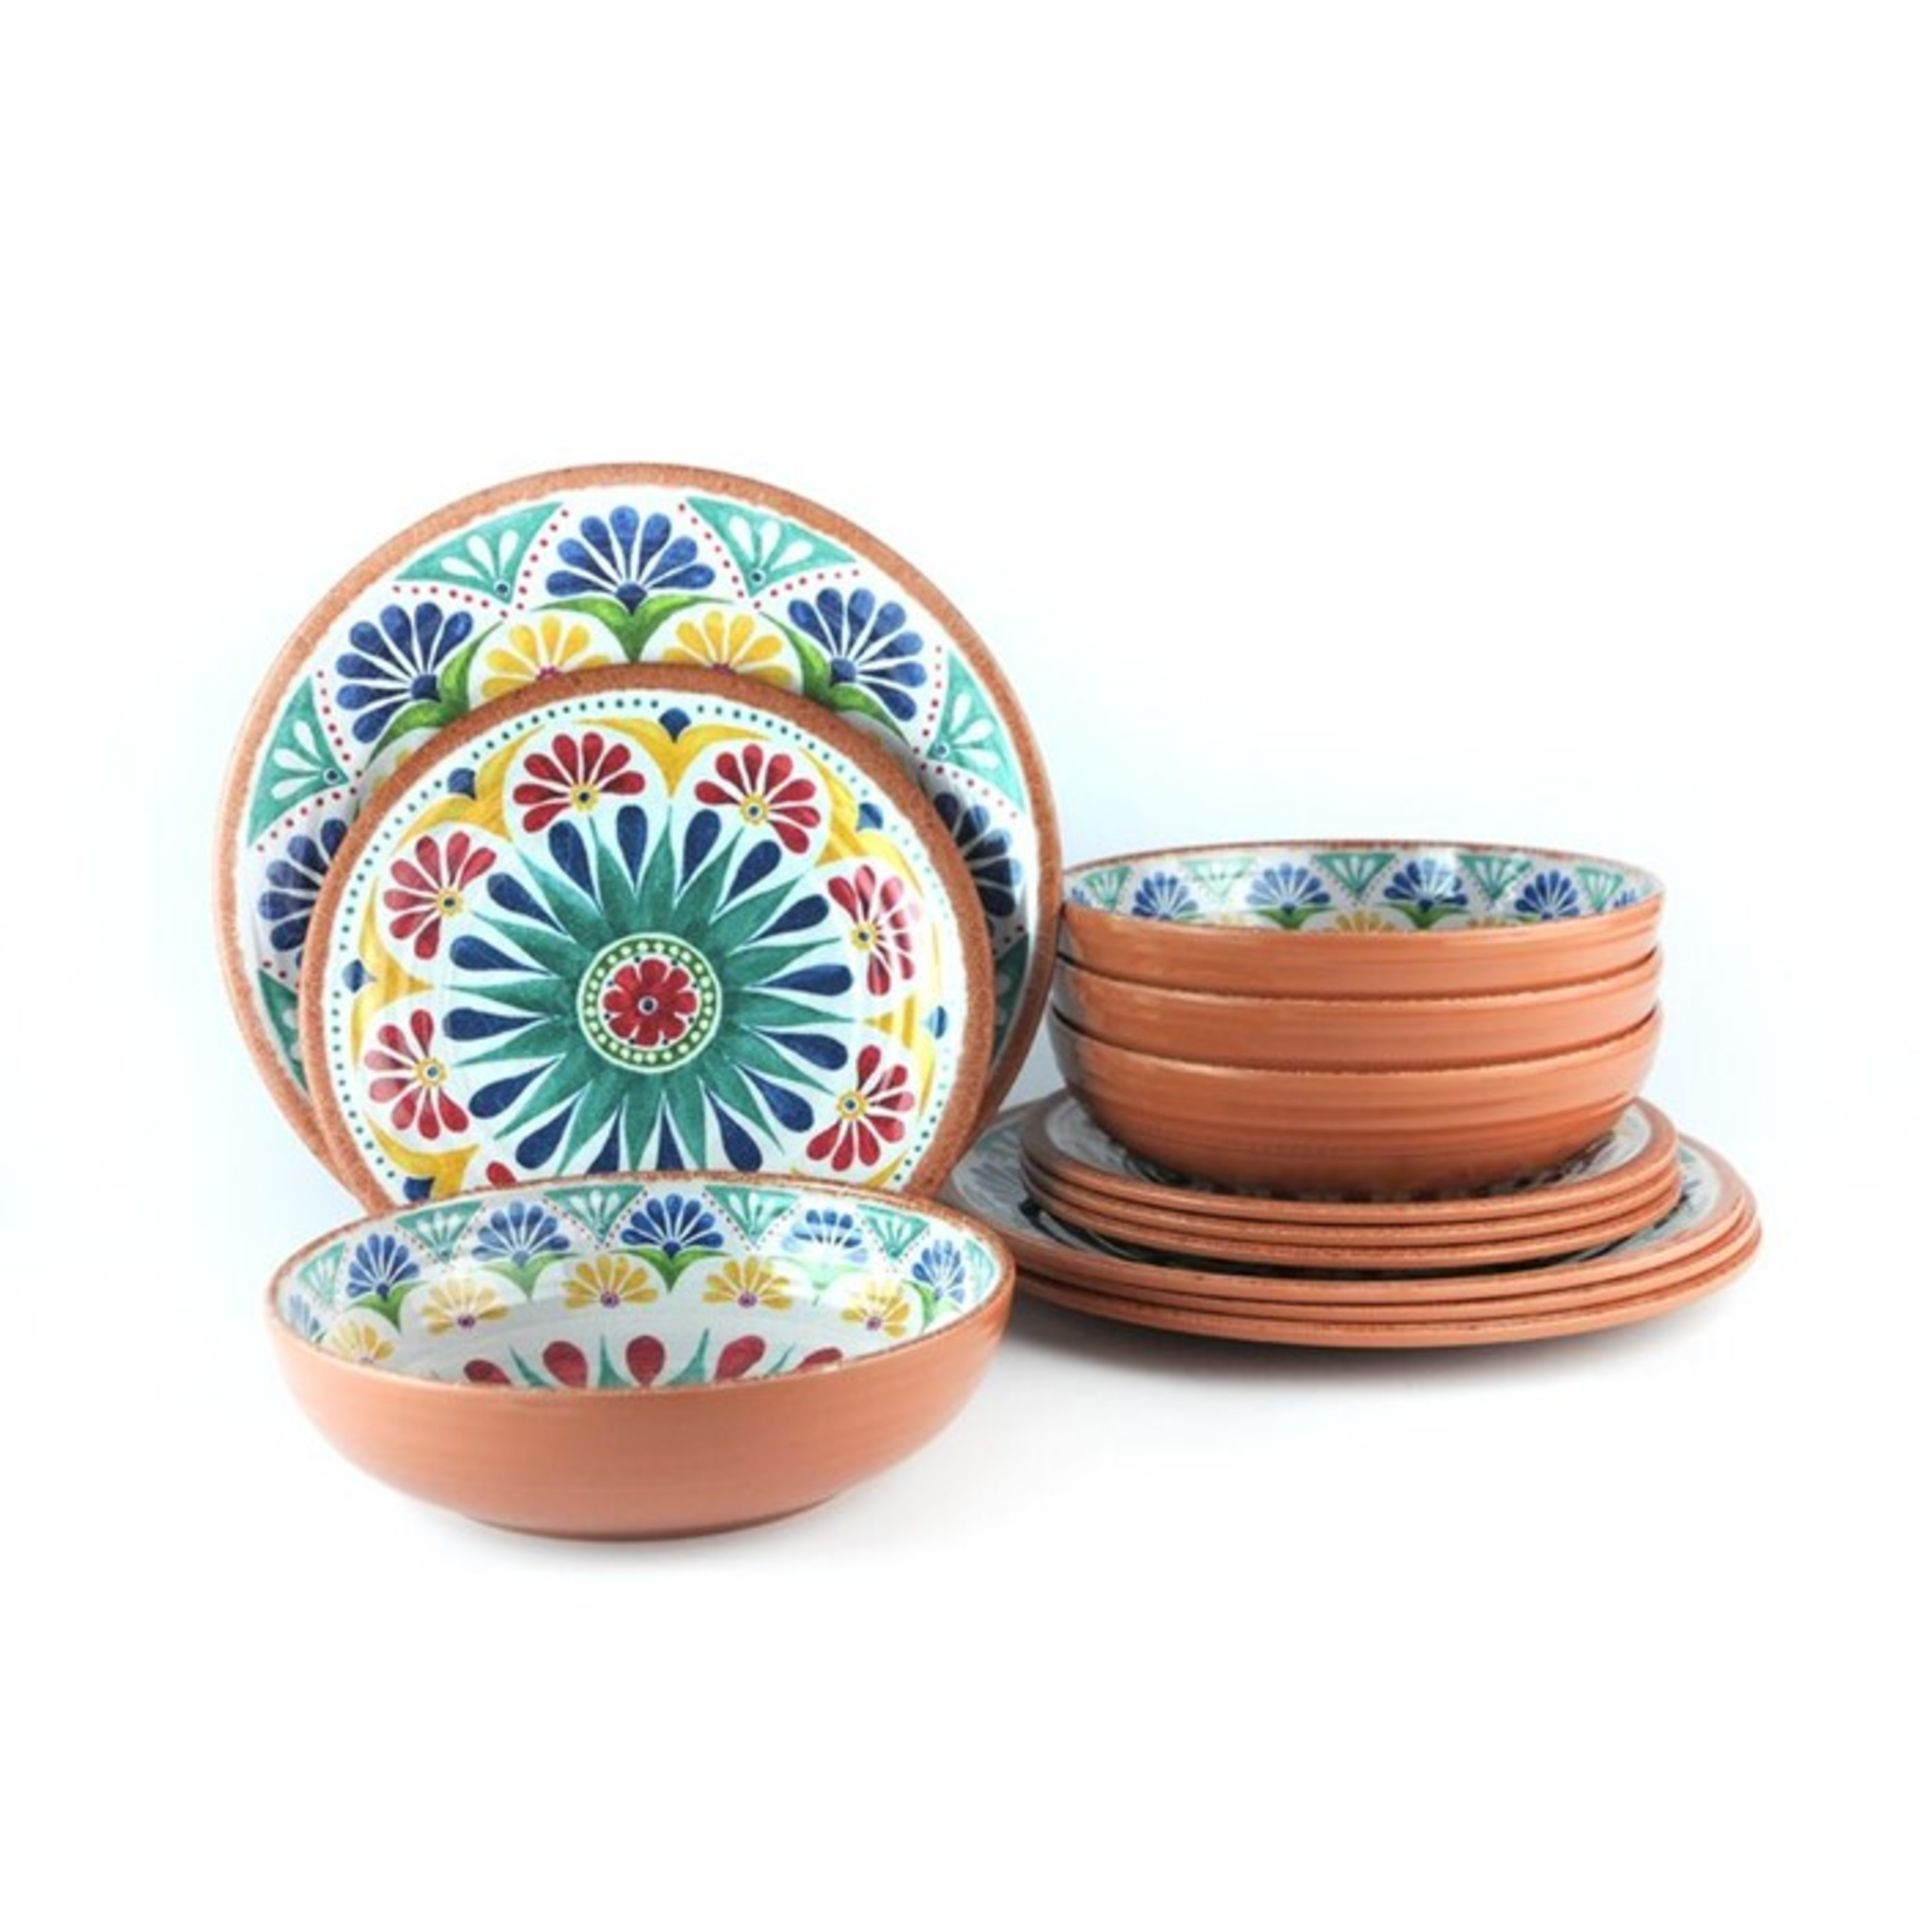 Tar Hong, Rio 24 Piece Melamine Dinnerware Set, Service for 8 - RRP£66.99 (QEFF1472 - 22262/3) 1A